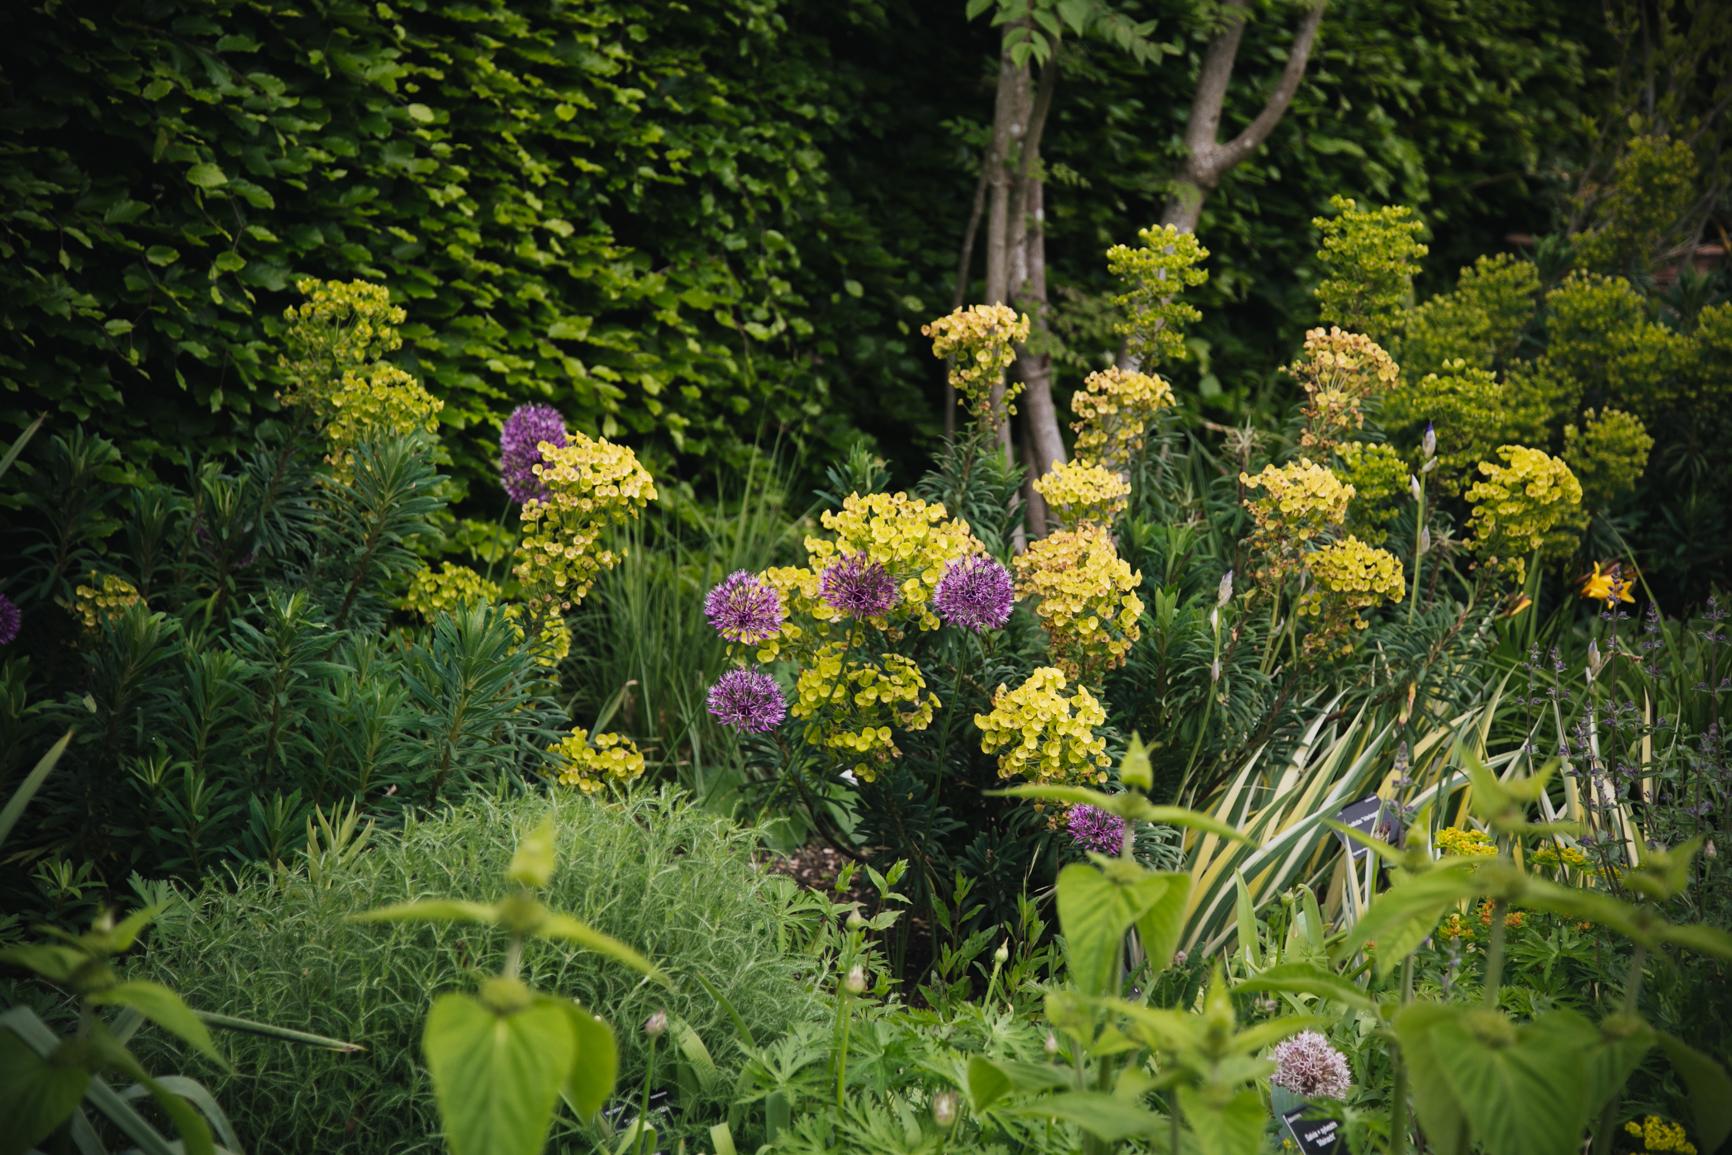 Jardin-botanique-universite-de-cambridge-blog.jpg